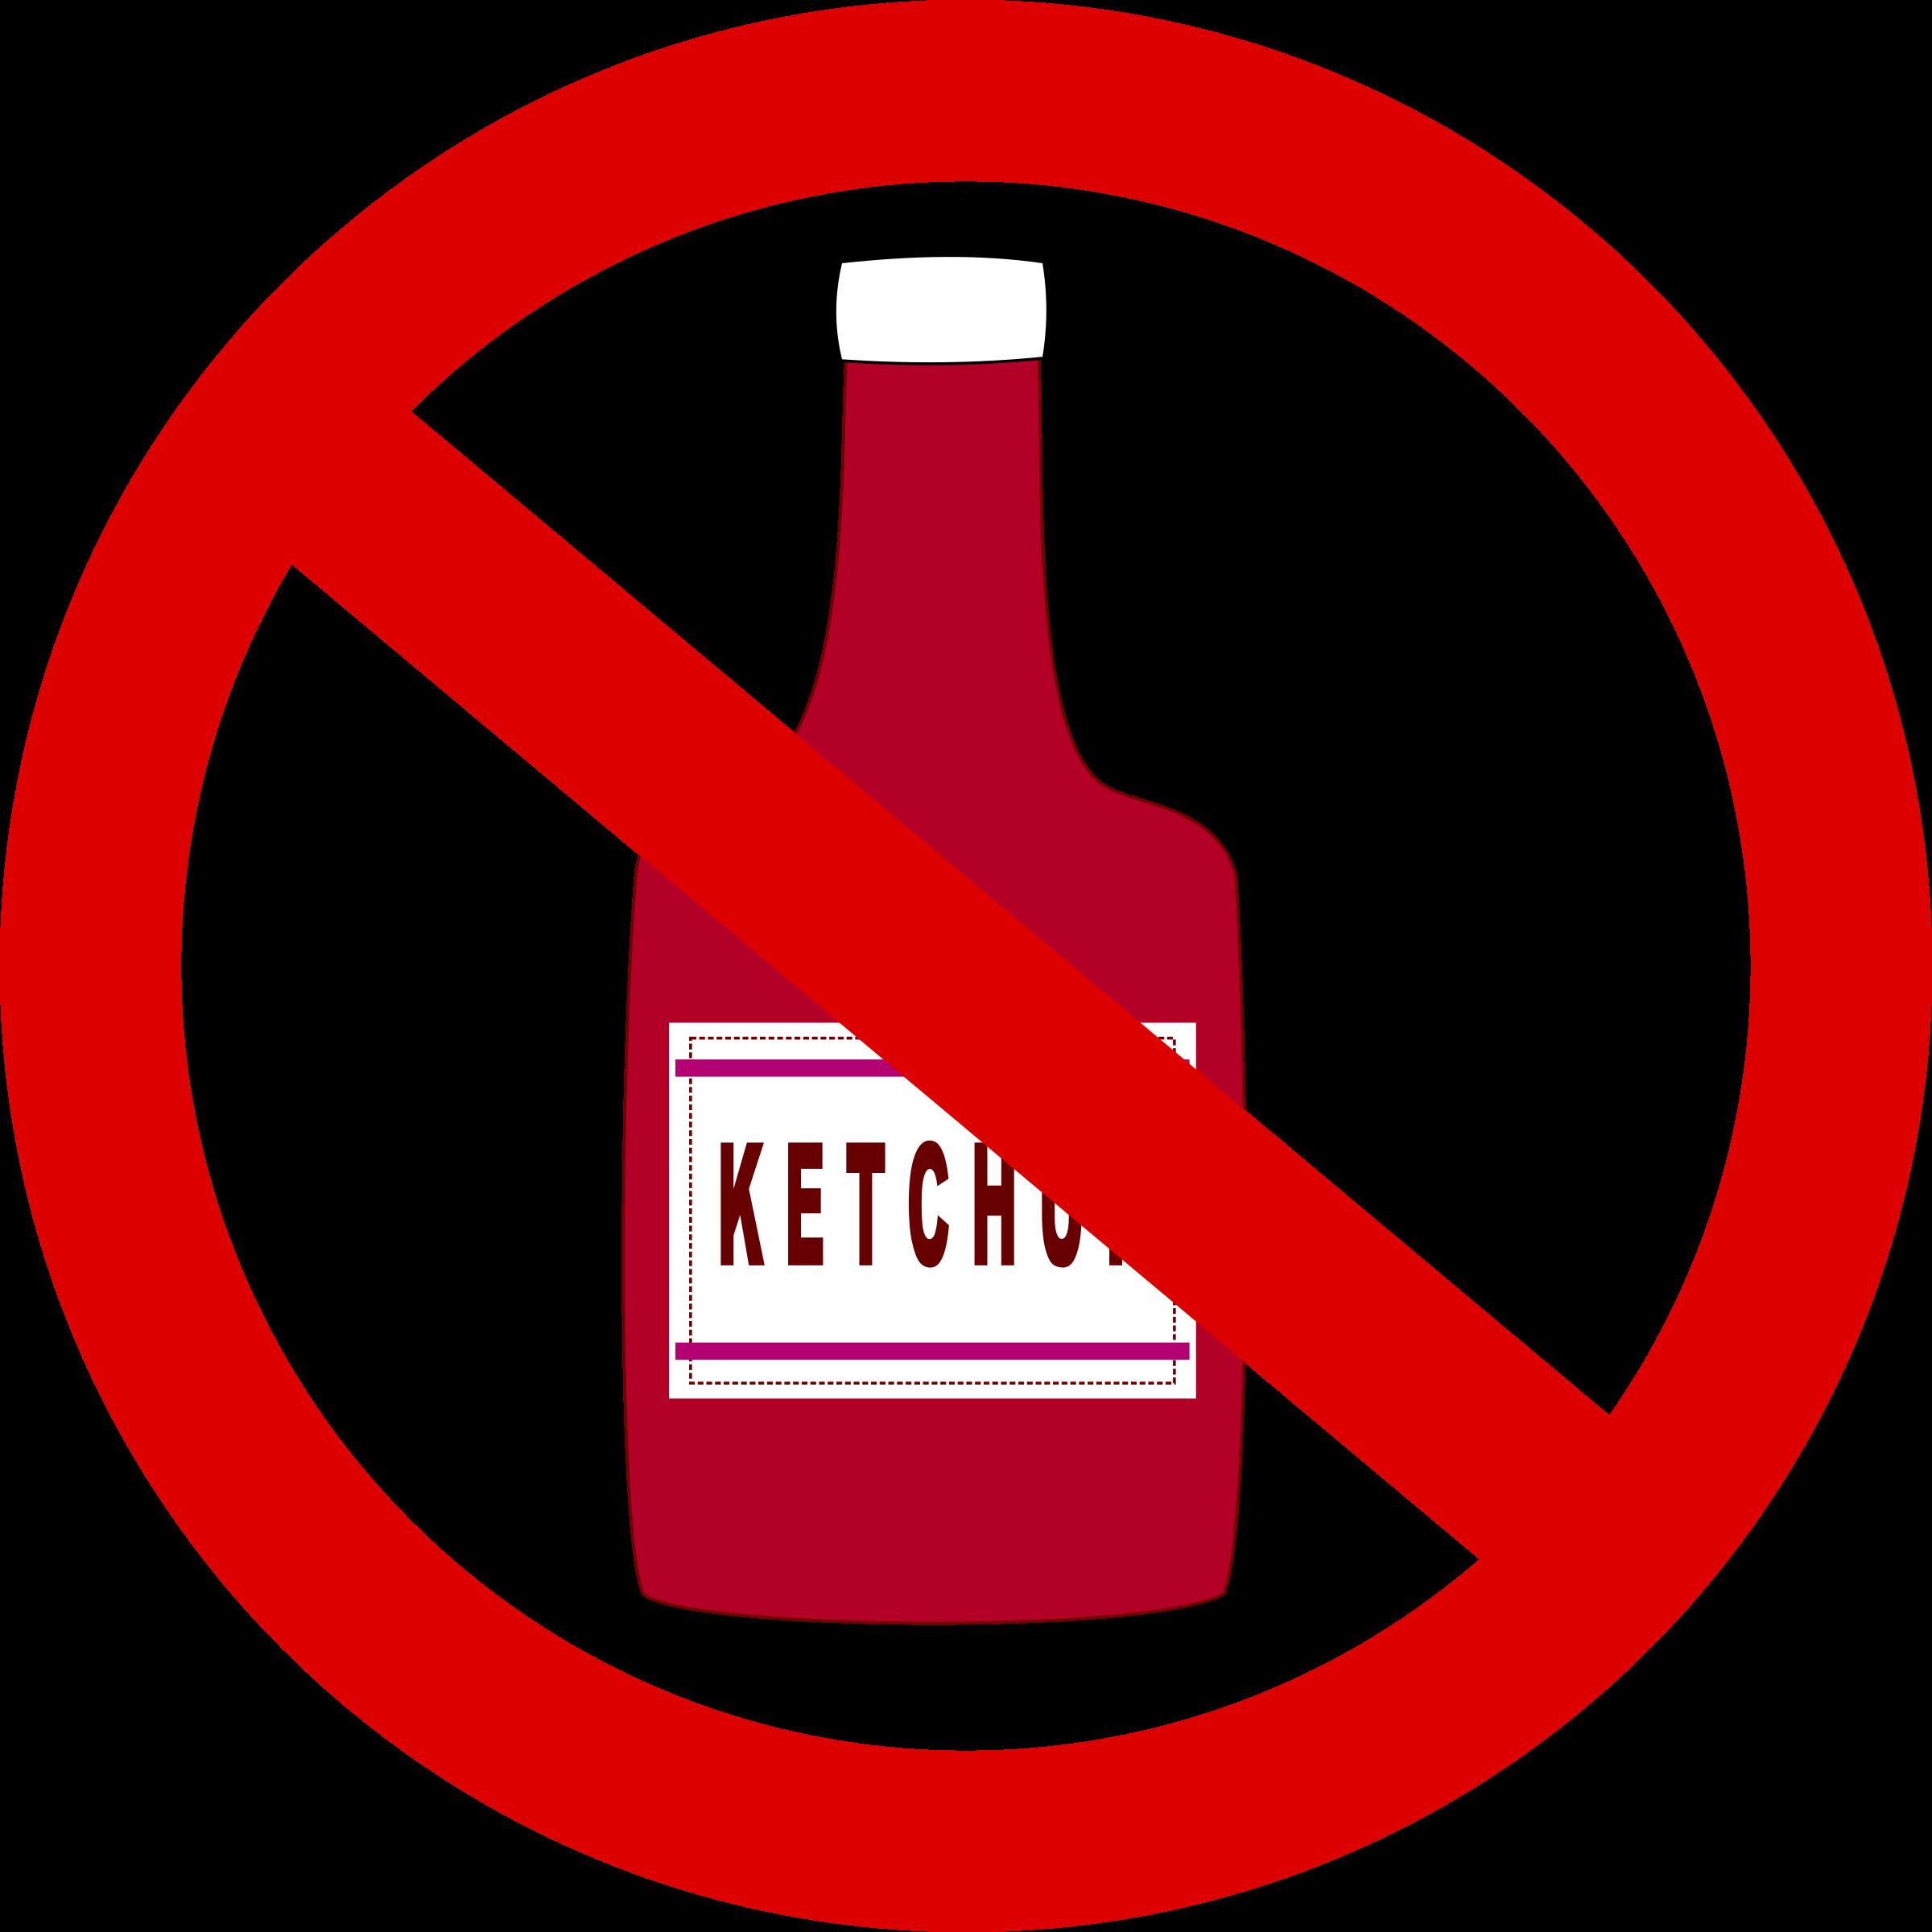 banner freeuse Clipart ketchup. Forbidden big image png